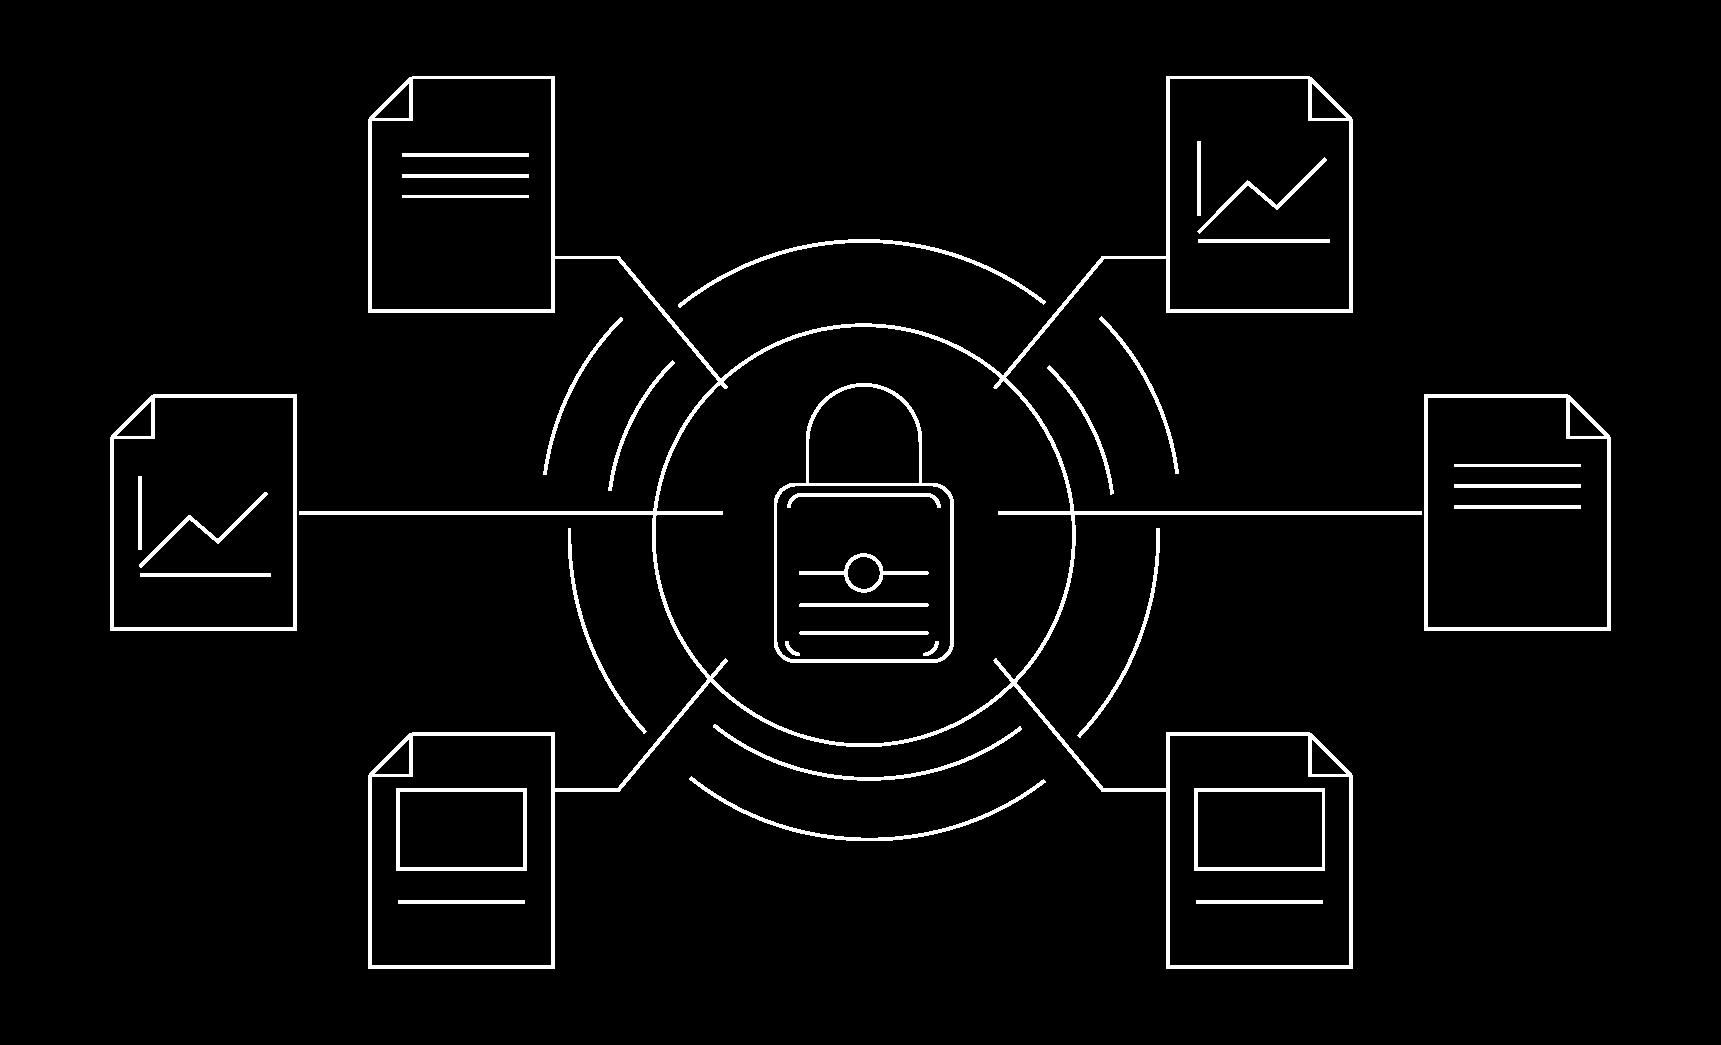 privacybg